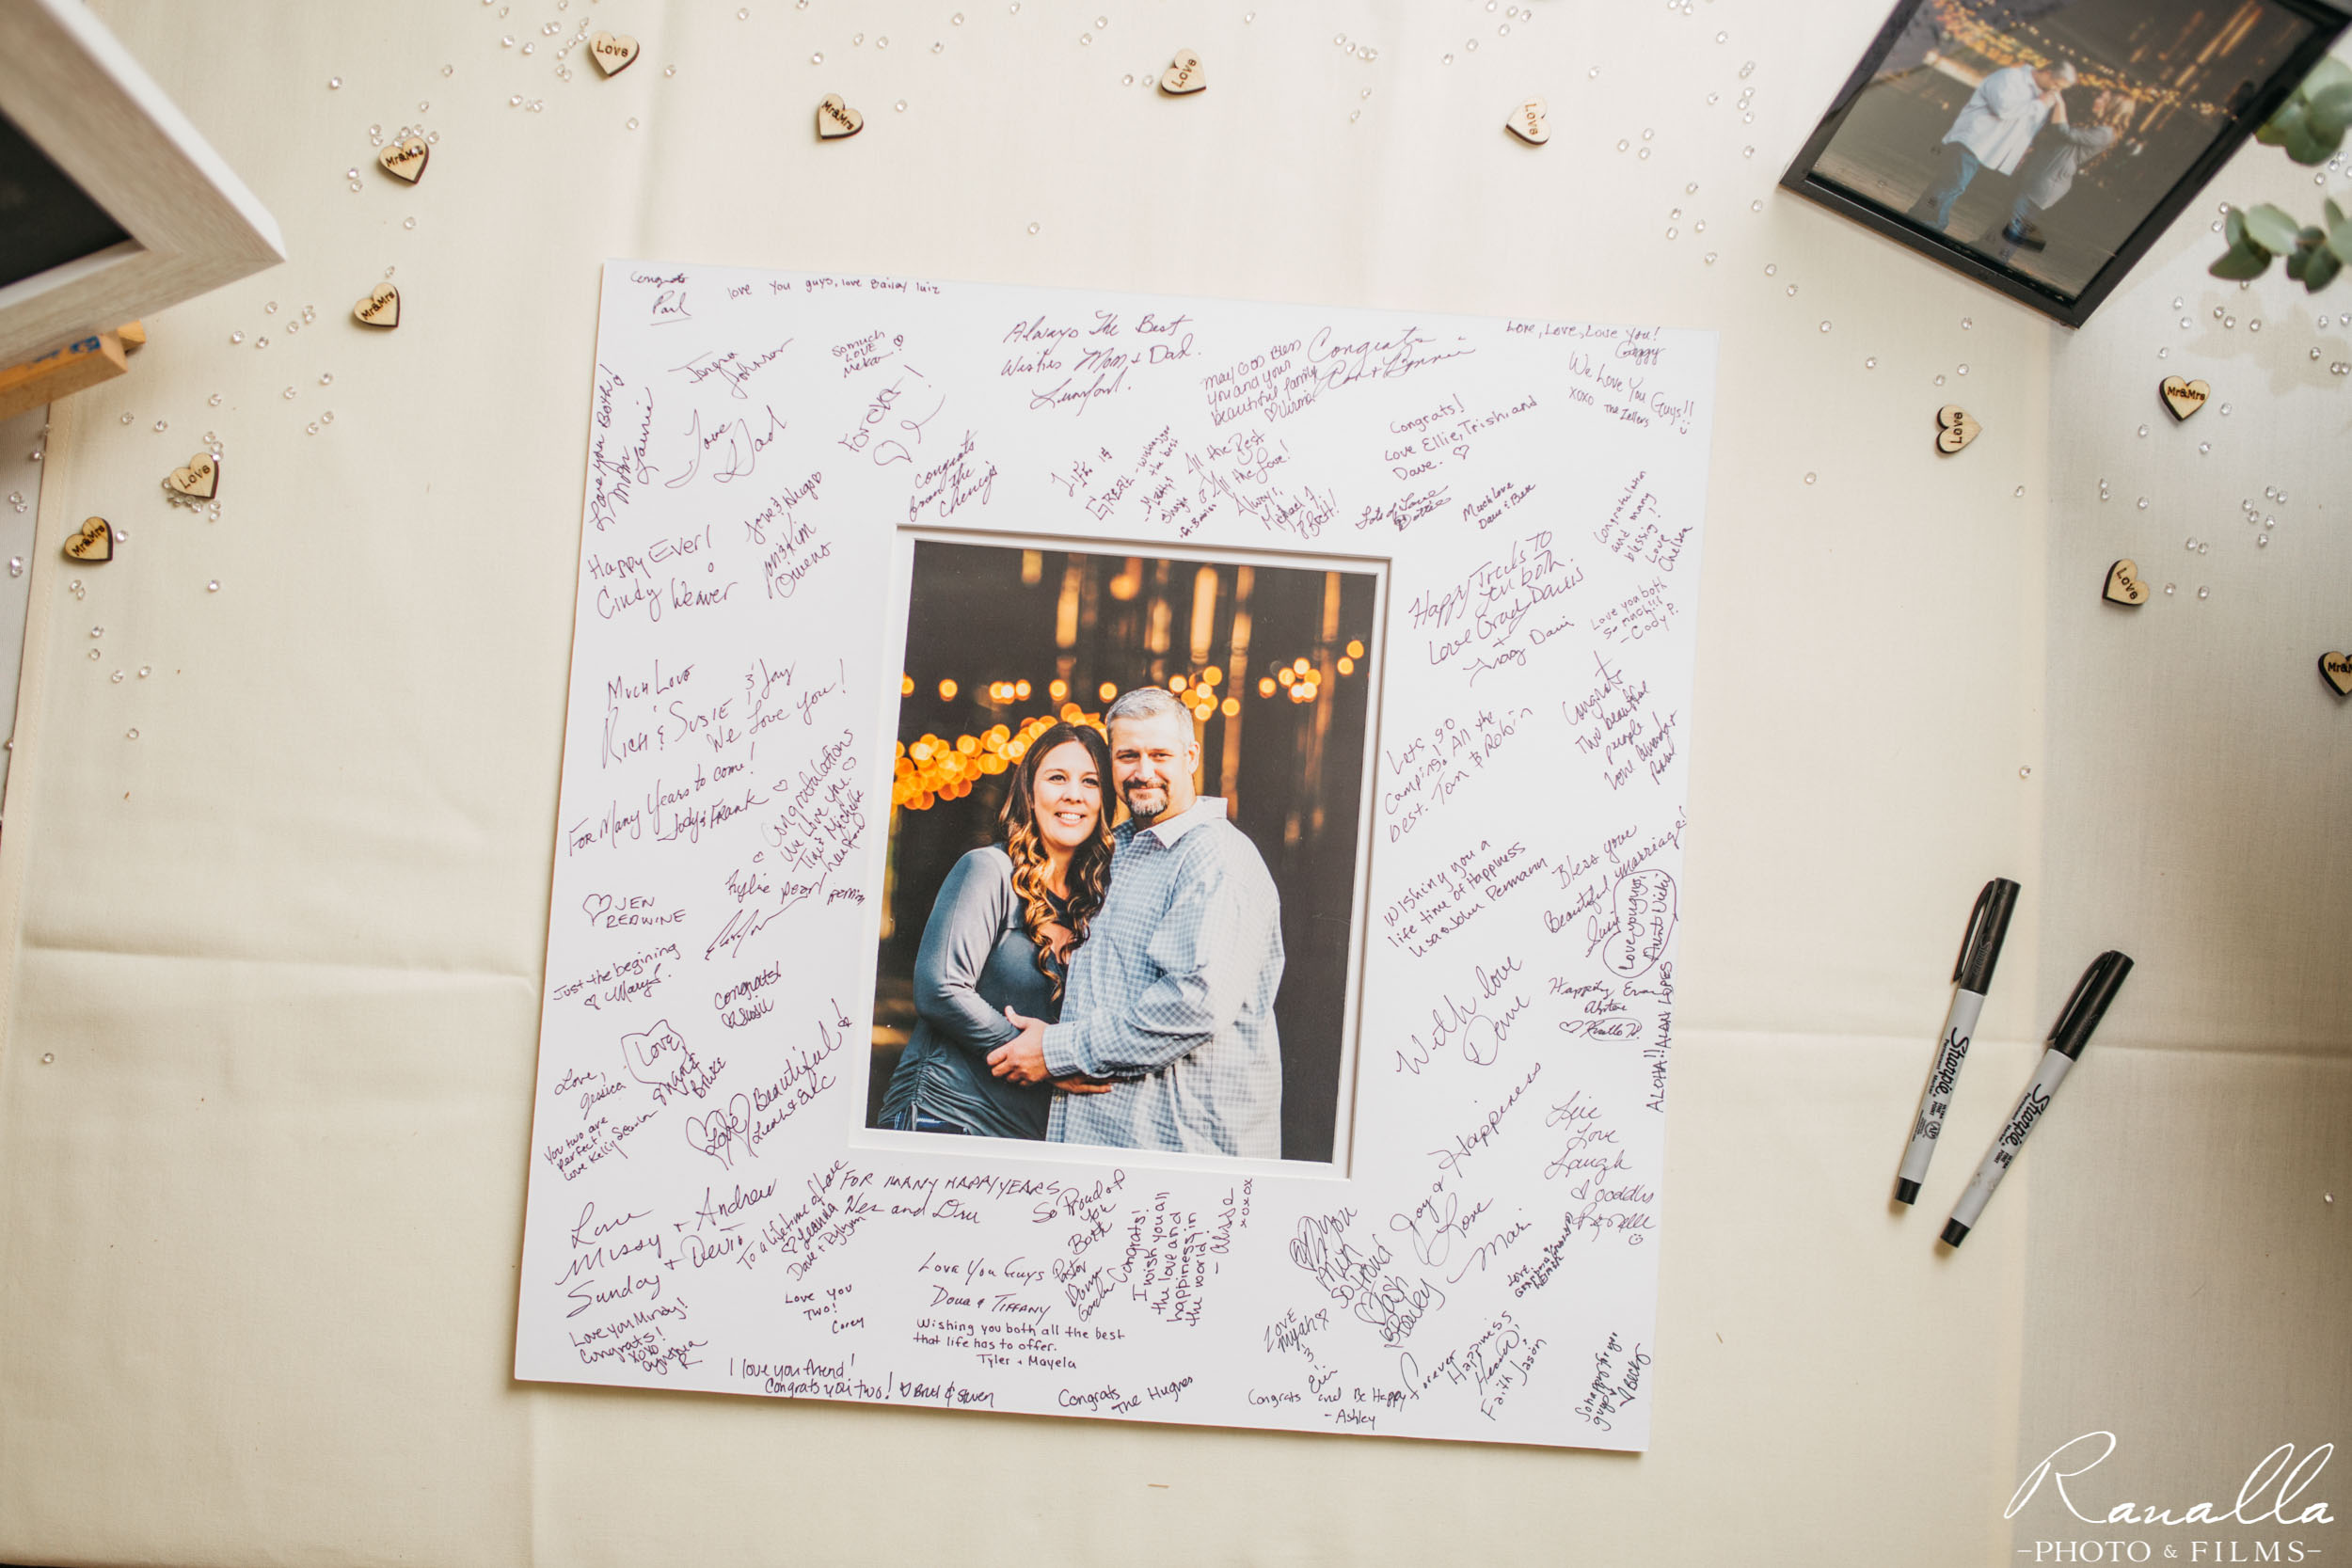 Chico Wedding Photography- Wedding Keepsake- Butte Creek Country Club- Ranalla Photo & Films